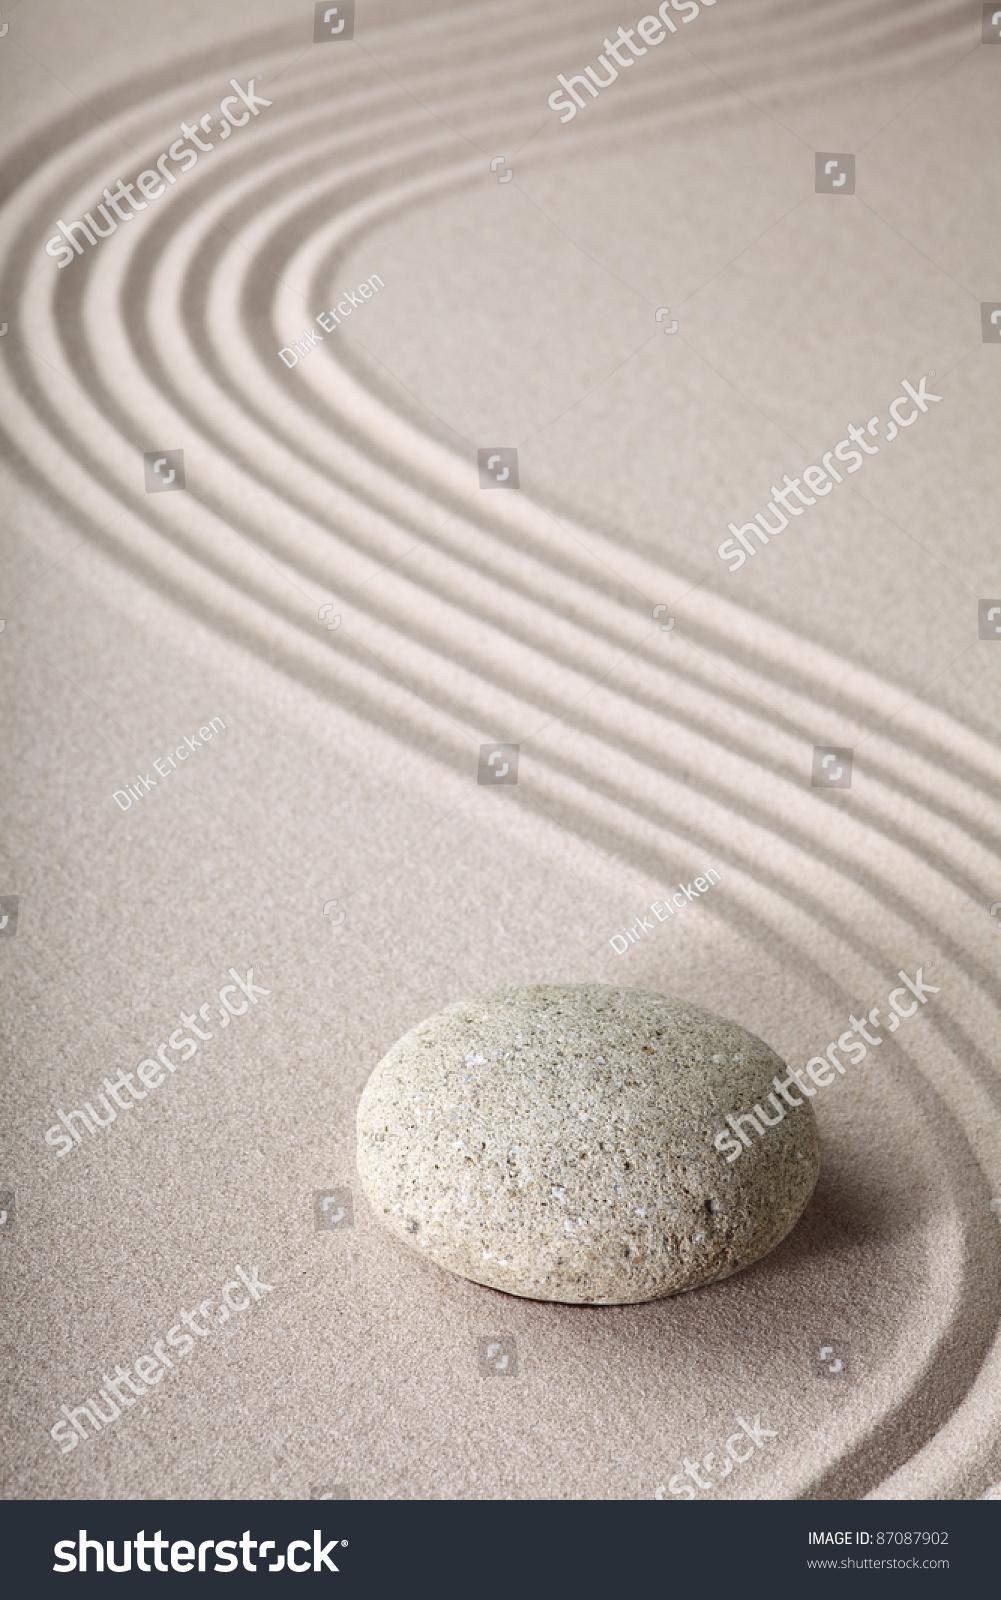 Zen Garden Japanese Garden Zen Stone With Raked Sand And